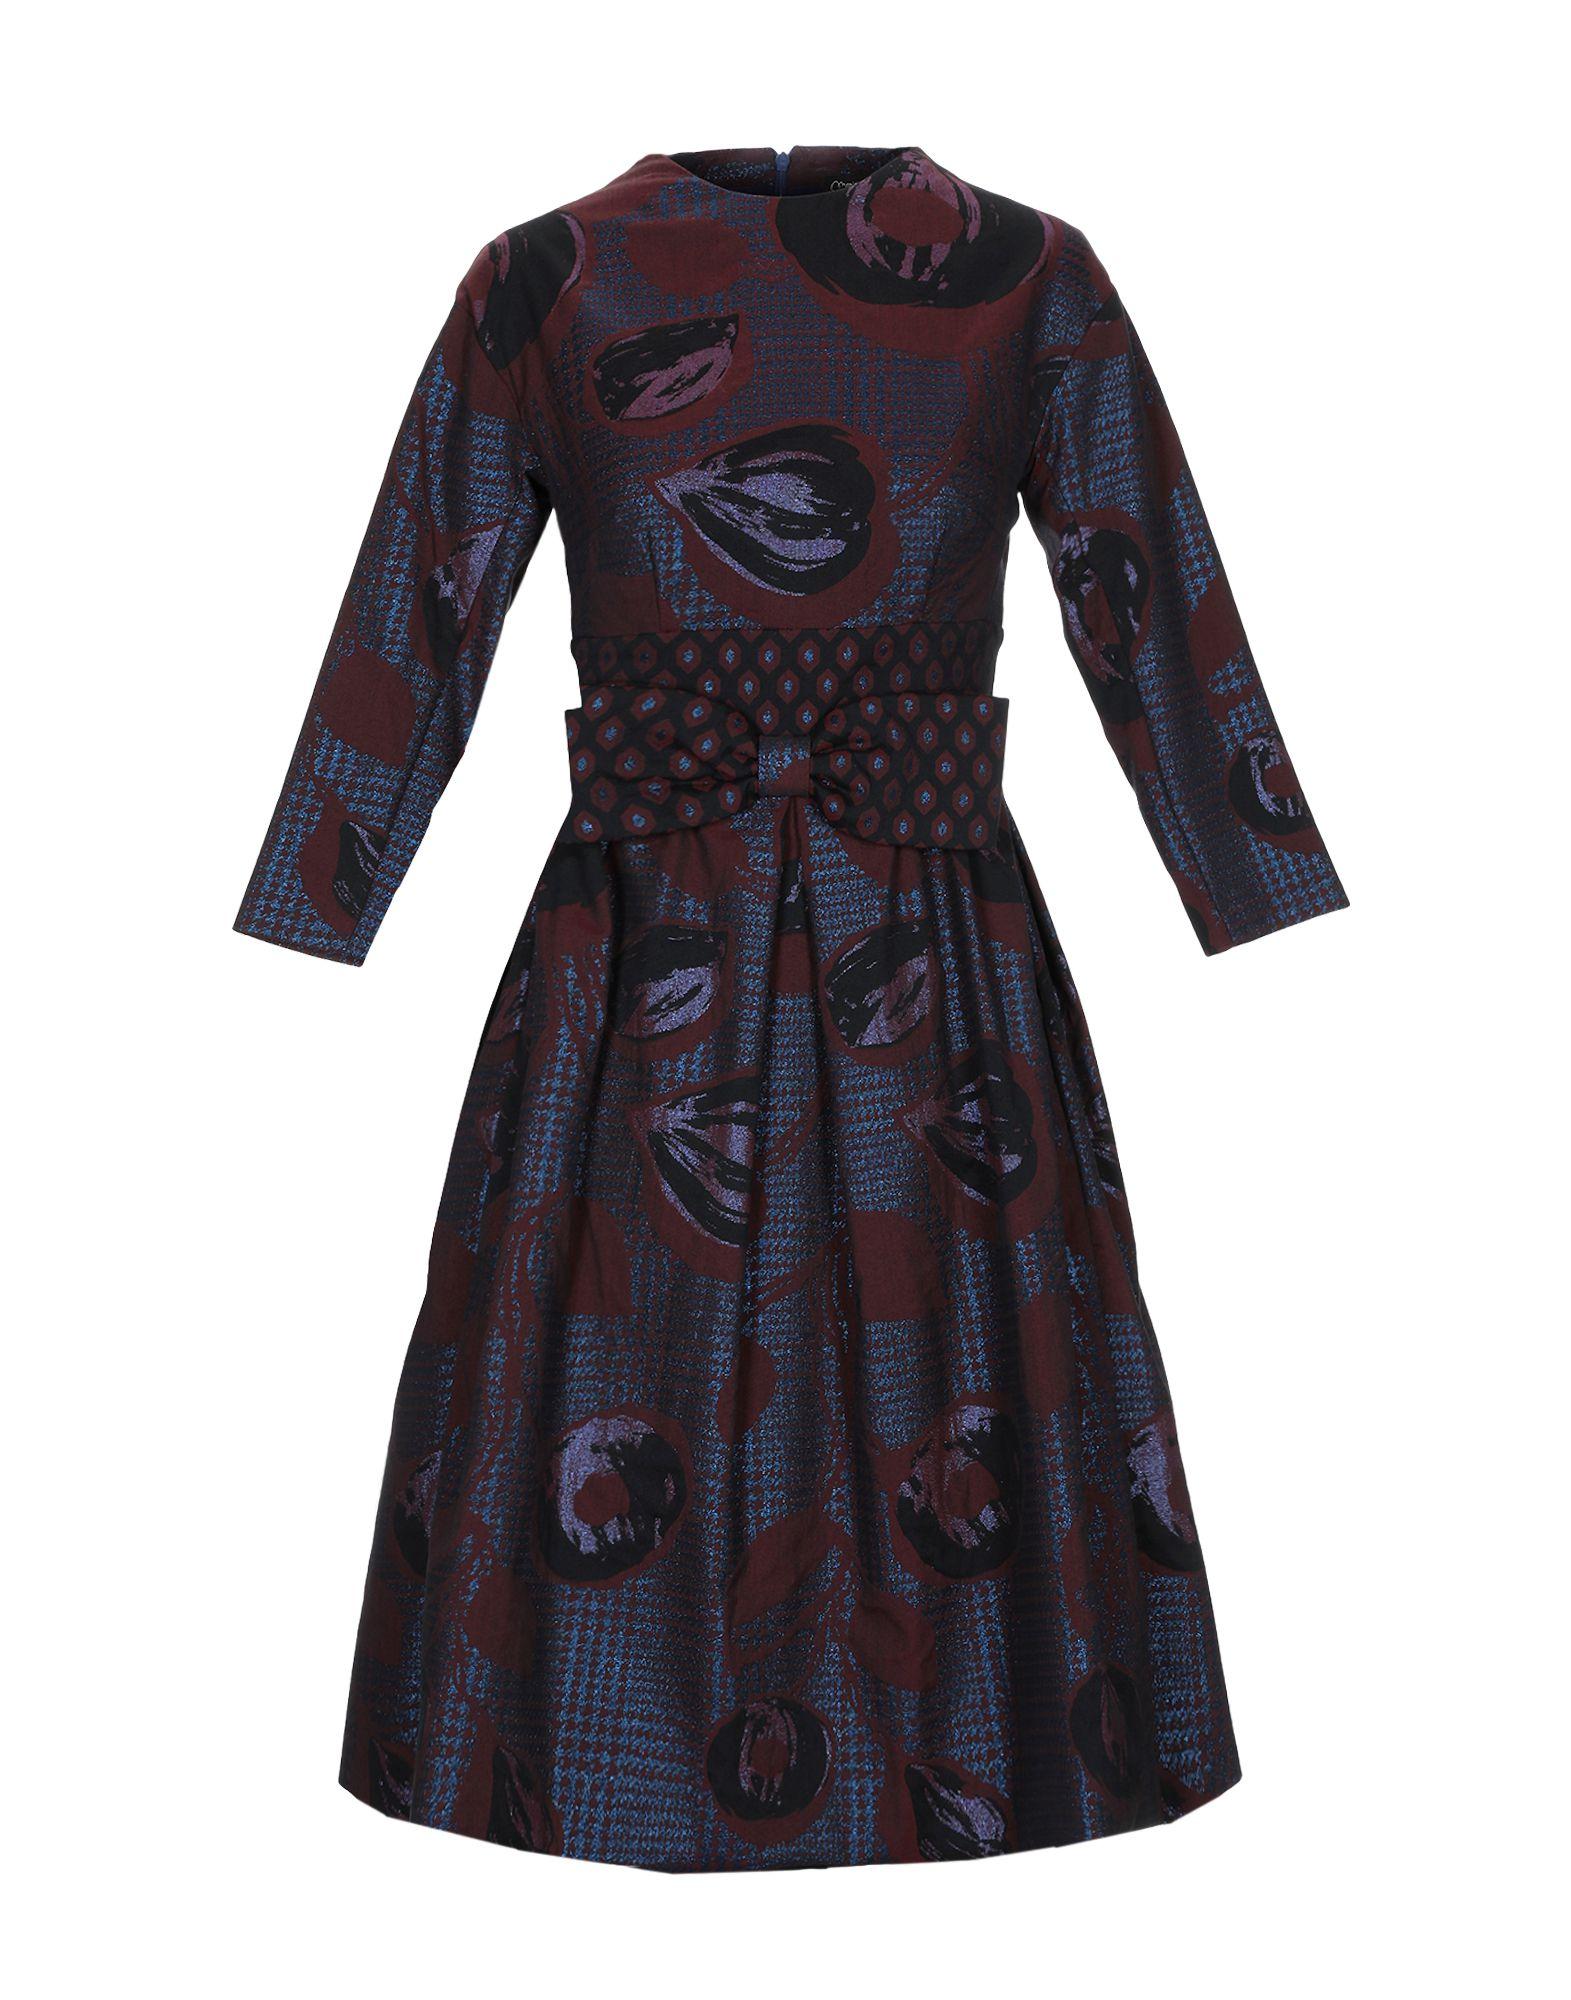 mariagrazia panizzi юбка длиной 3 4 MARIAGRAZIA PANIZZI Короткое платье